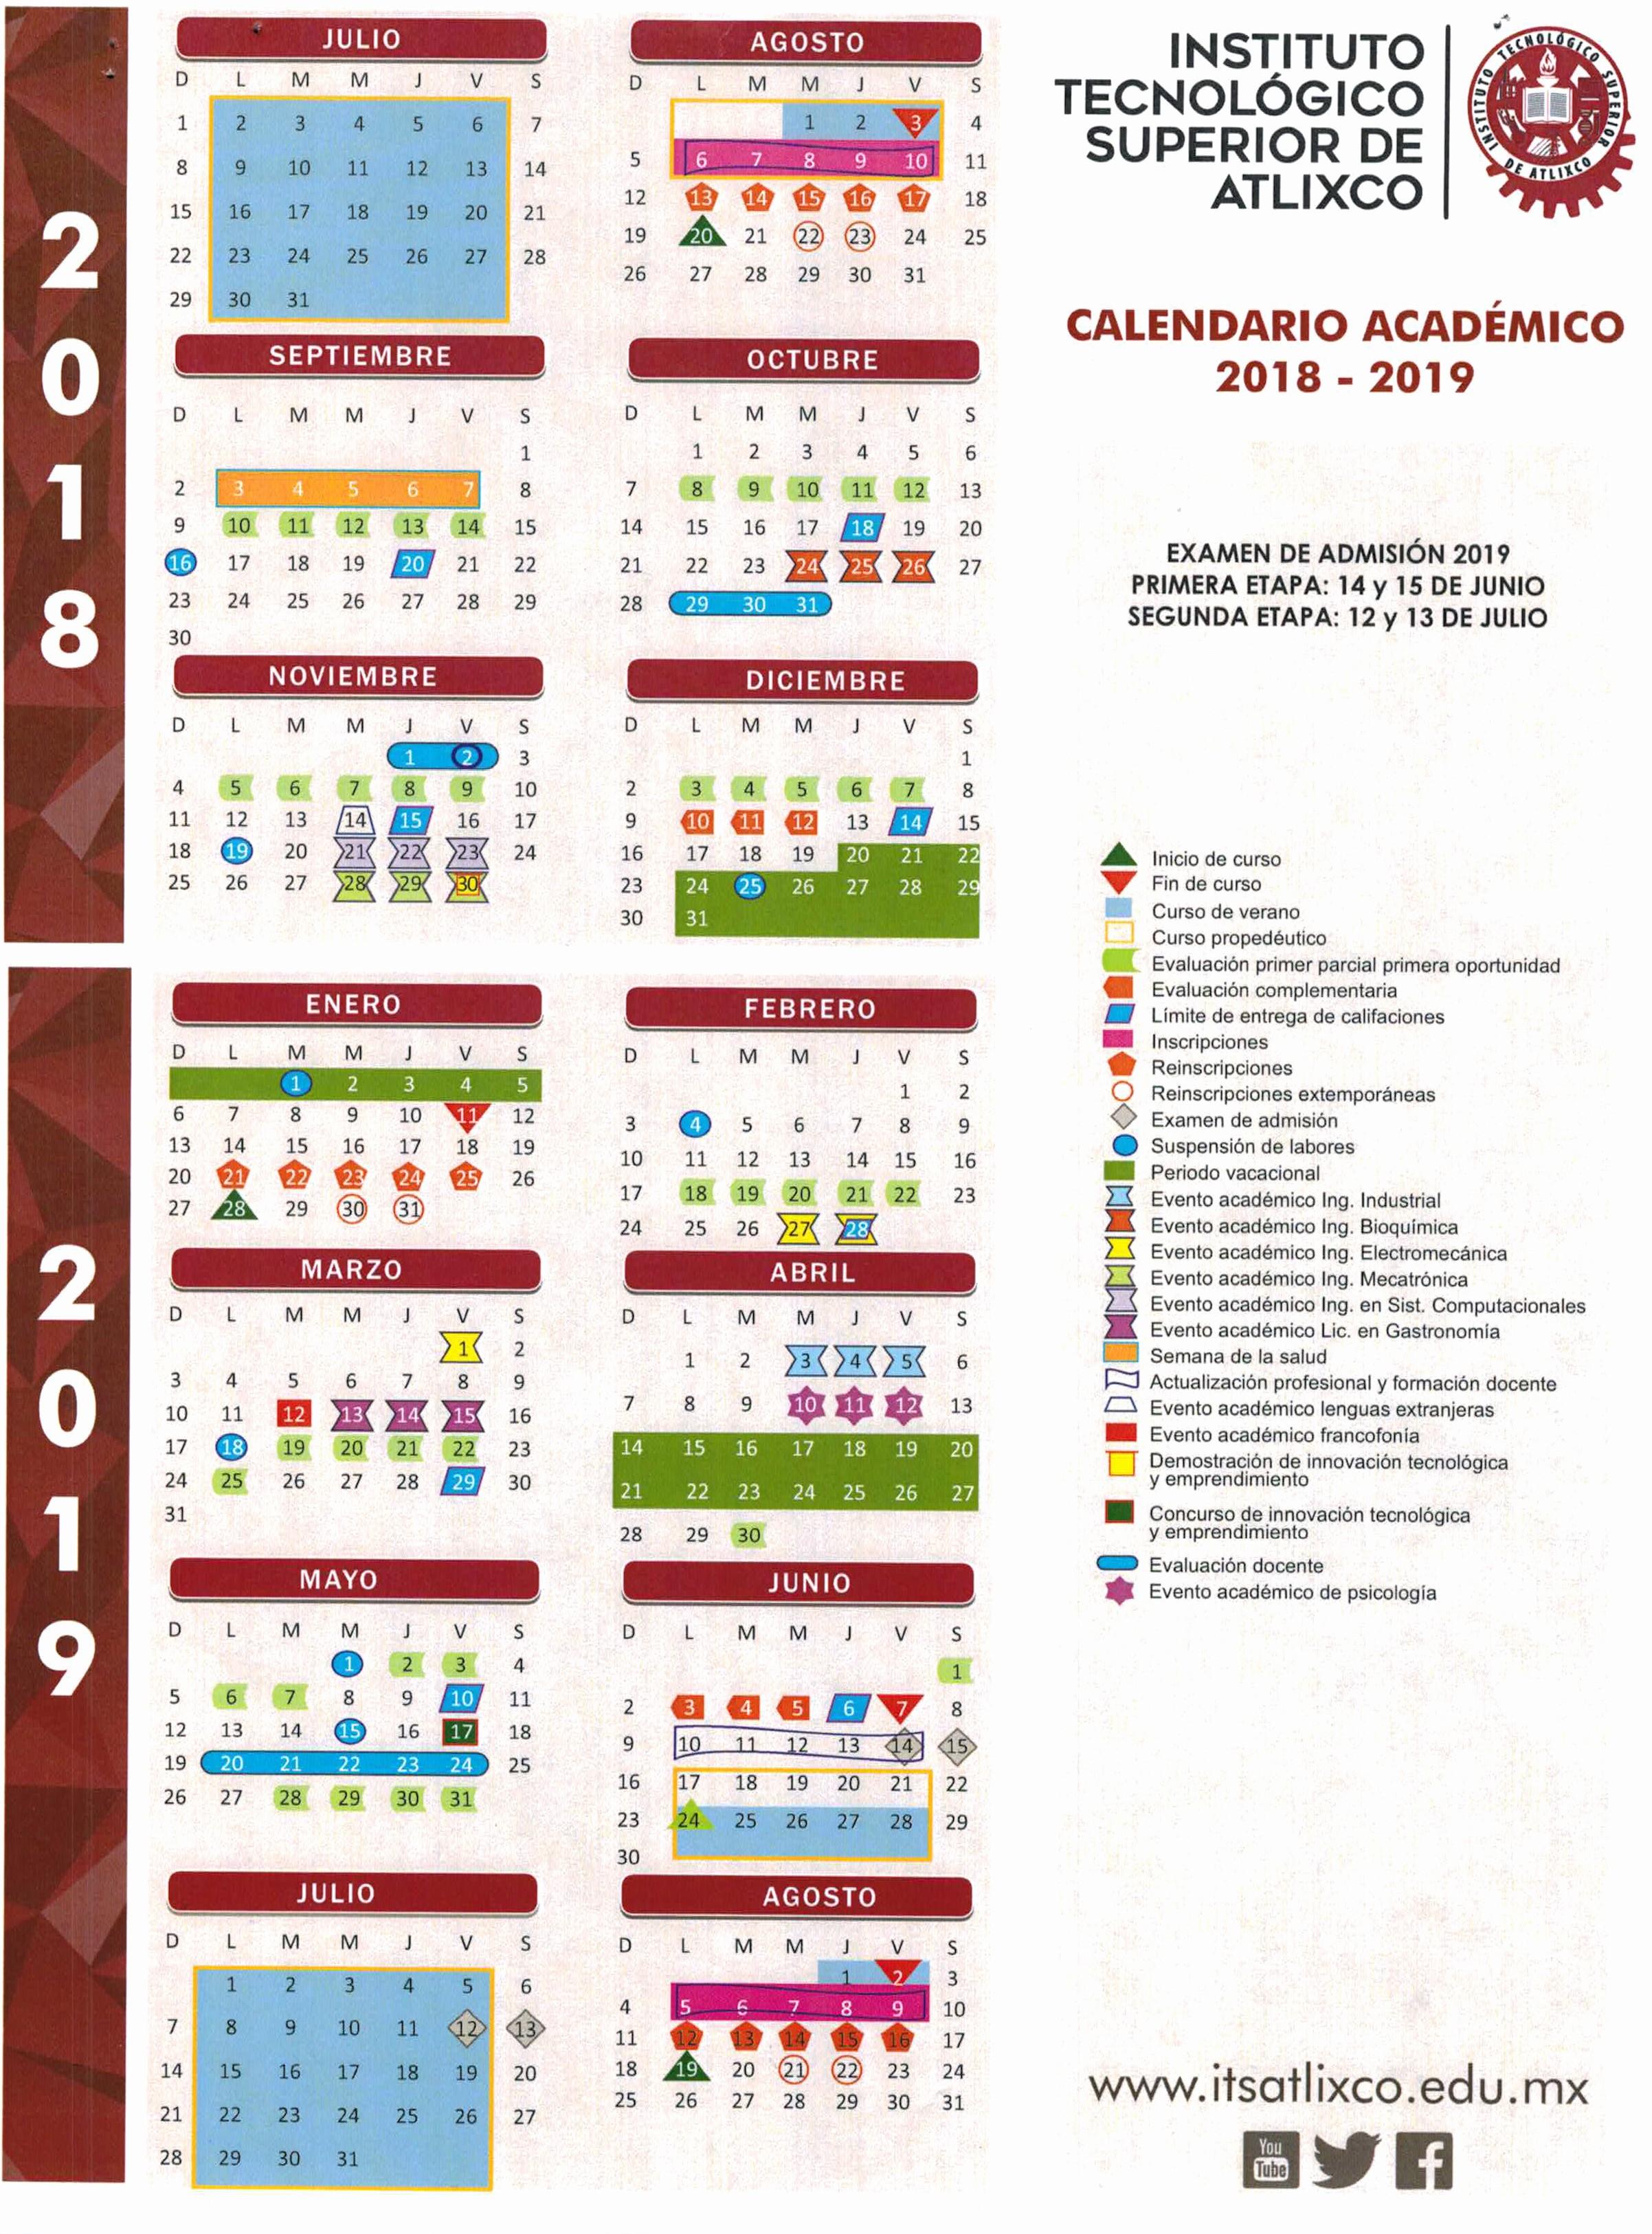 Calendario Para Imprimir Webcid Actual Beautiful 33 Ejemplos Runedia Calendario De Carreras 2019 Of Calendario Para Imprimir Webcid Actual Calendario 2018 Rj Hz43 Ivango